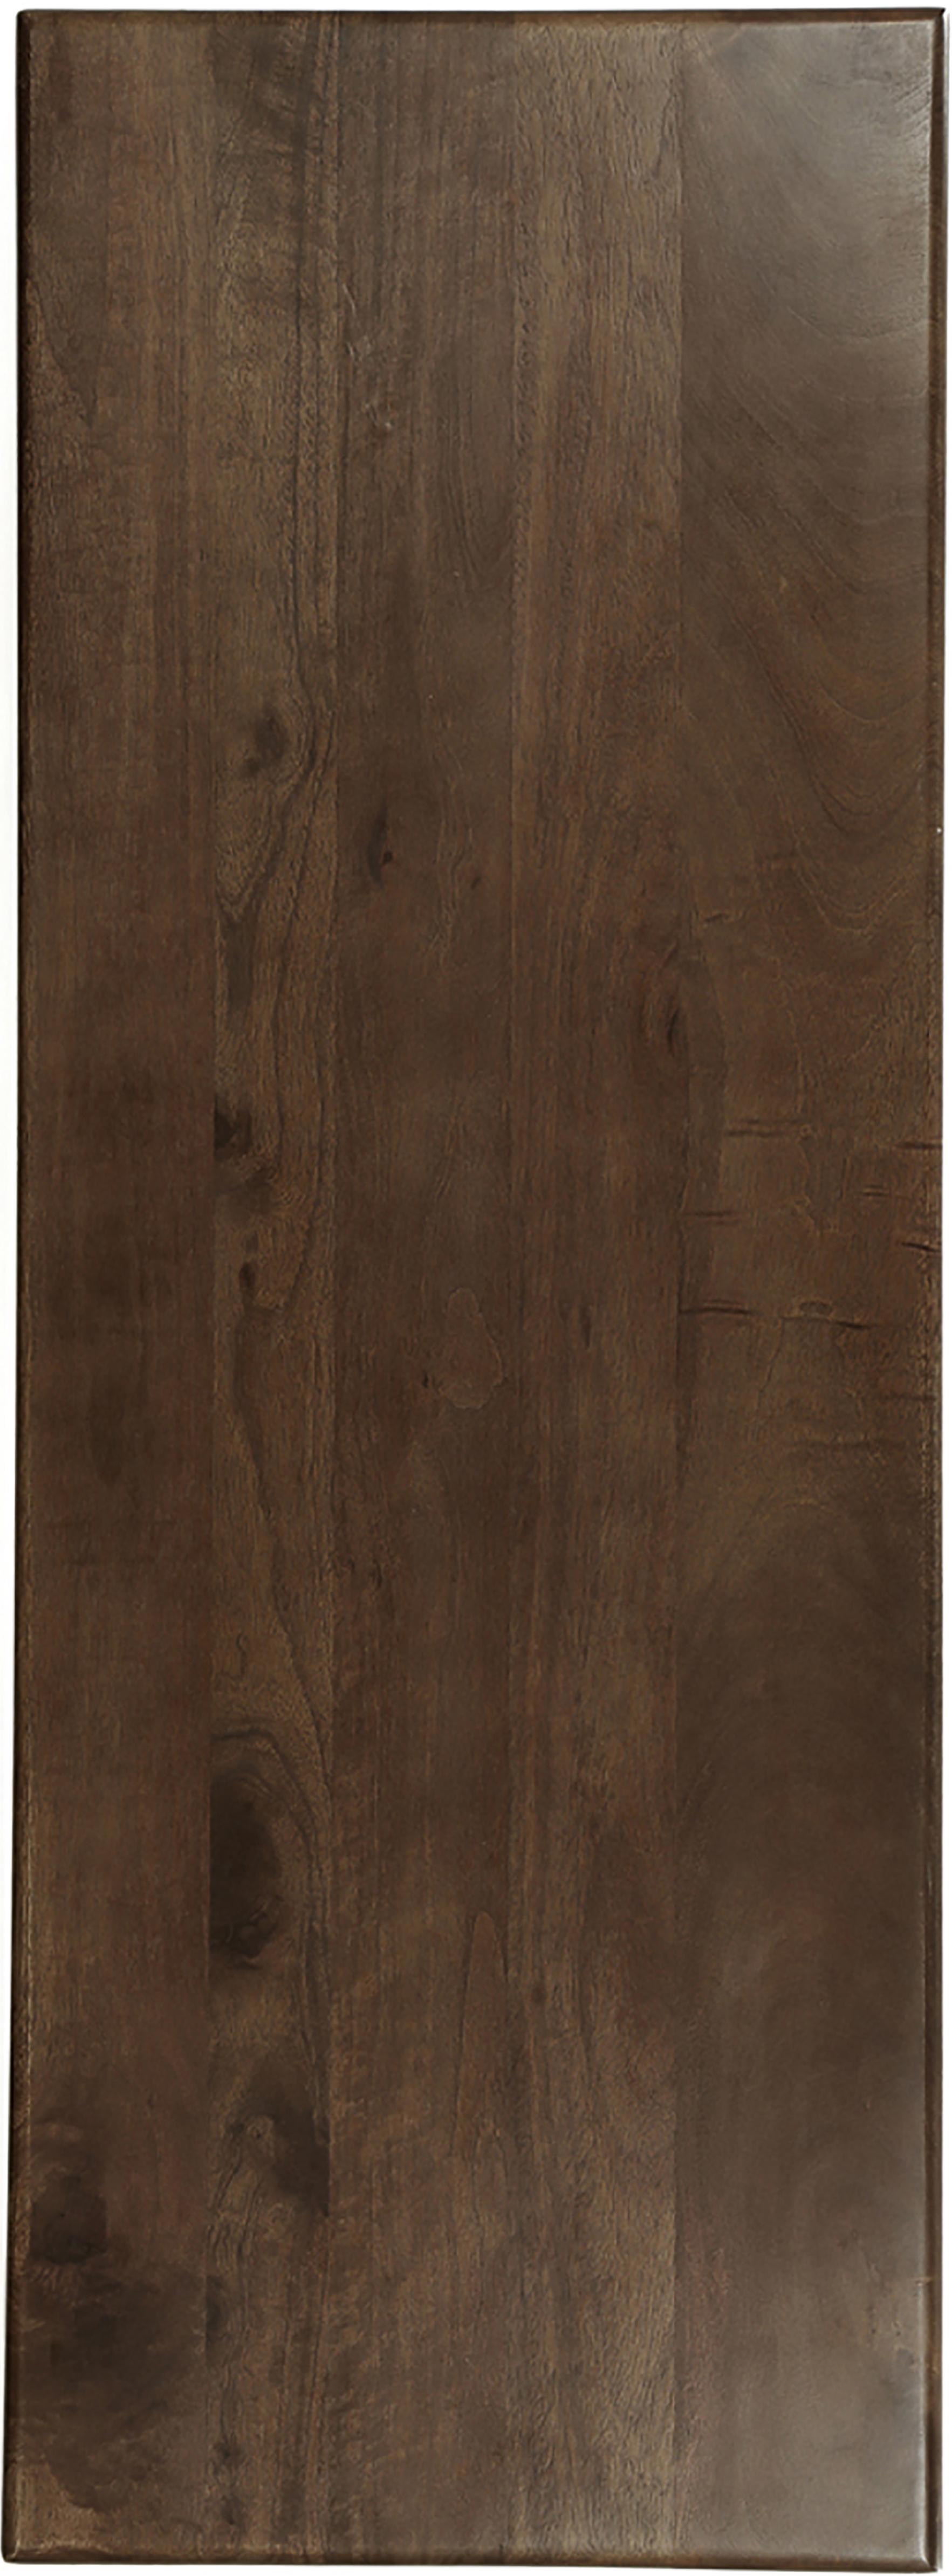 Konsole Oscar aus massivem Mangoholz, Mangoholz massiv, lackiert, Dunkelbraun, B 110 x T 40 cm